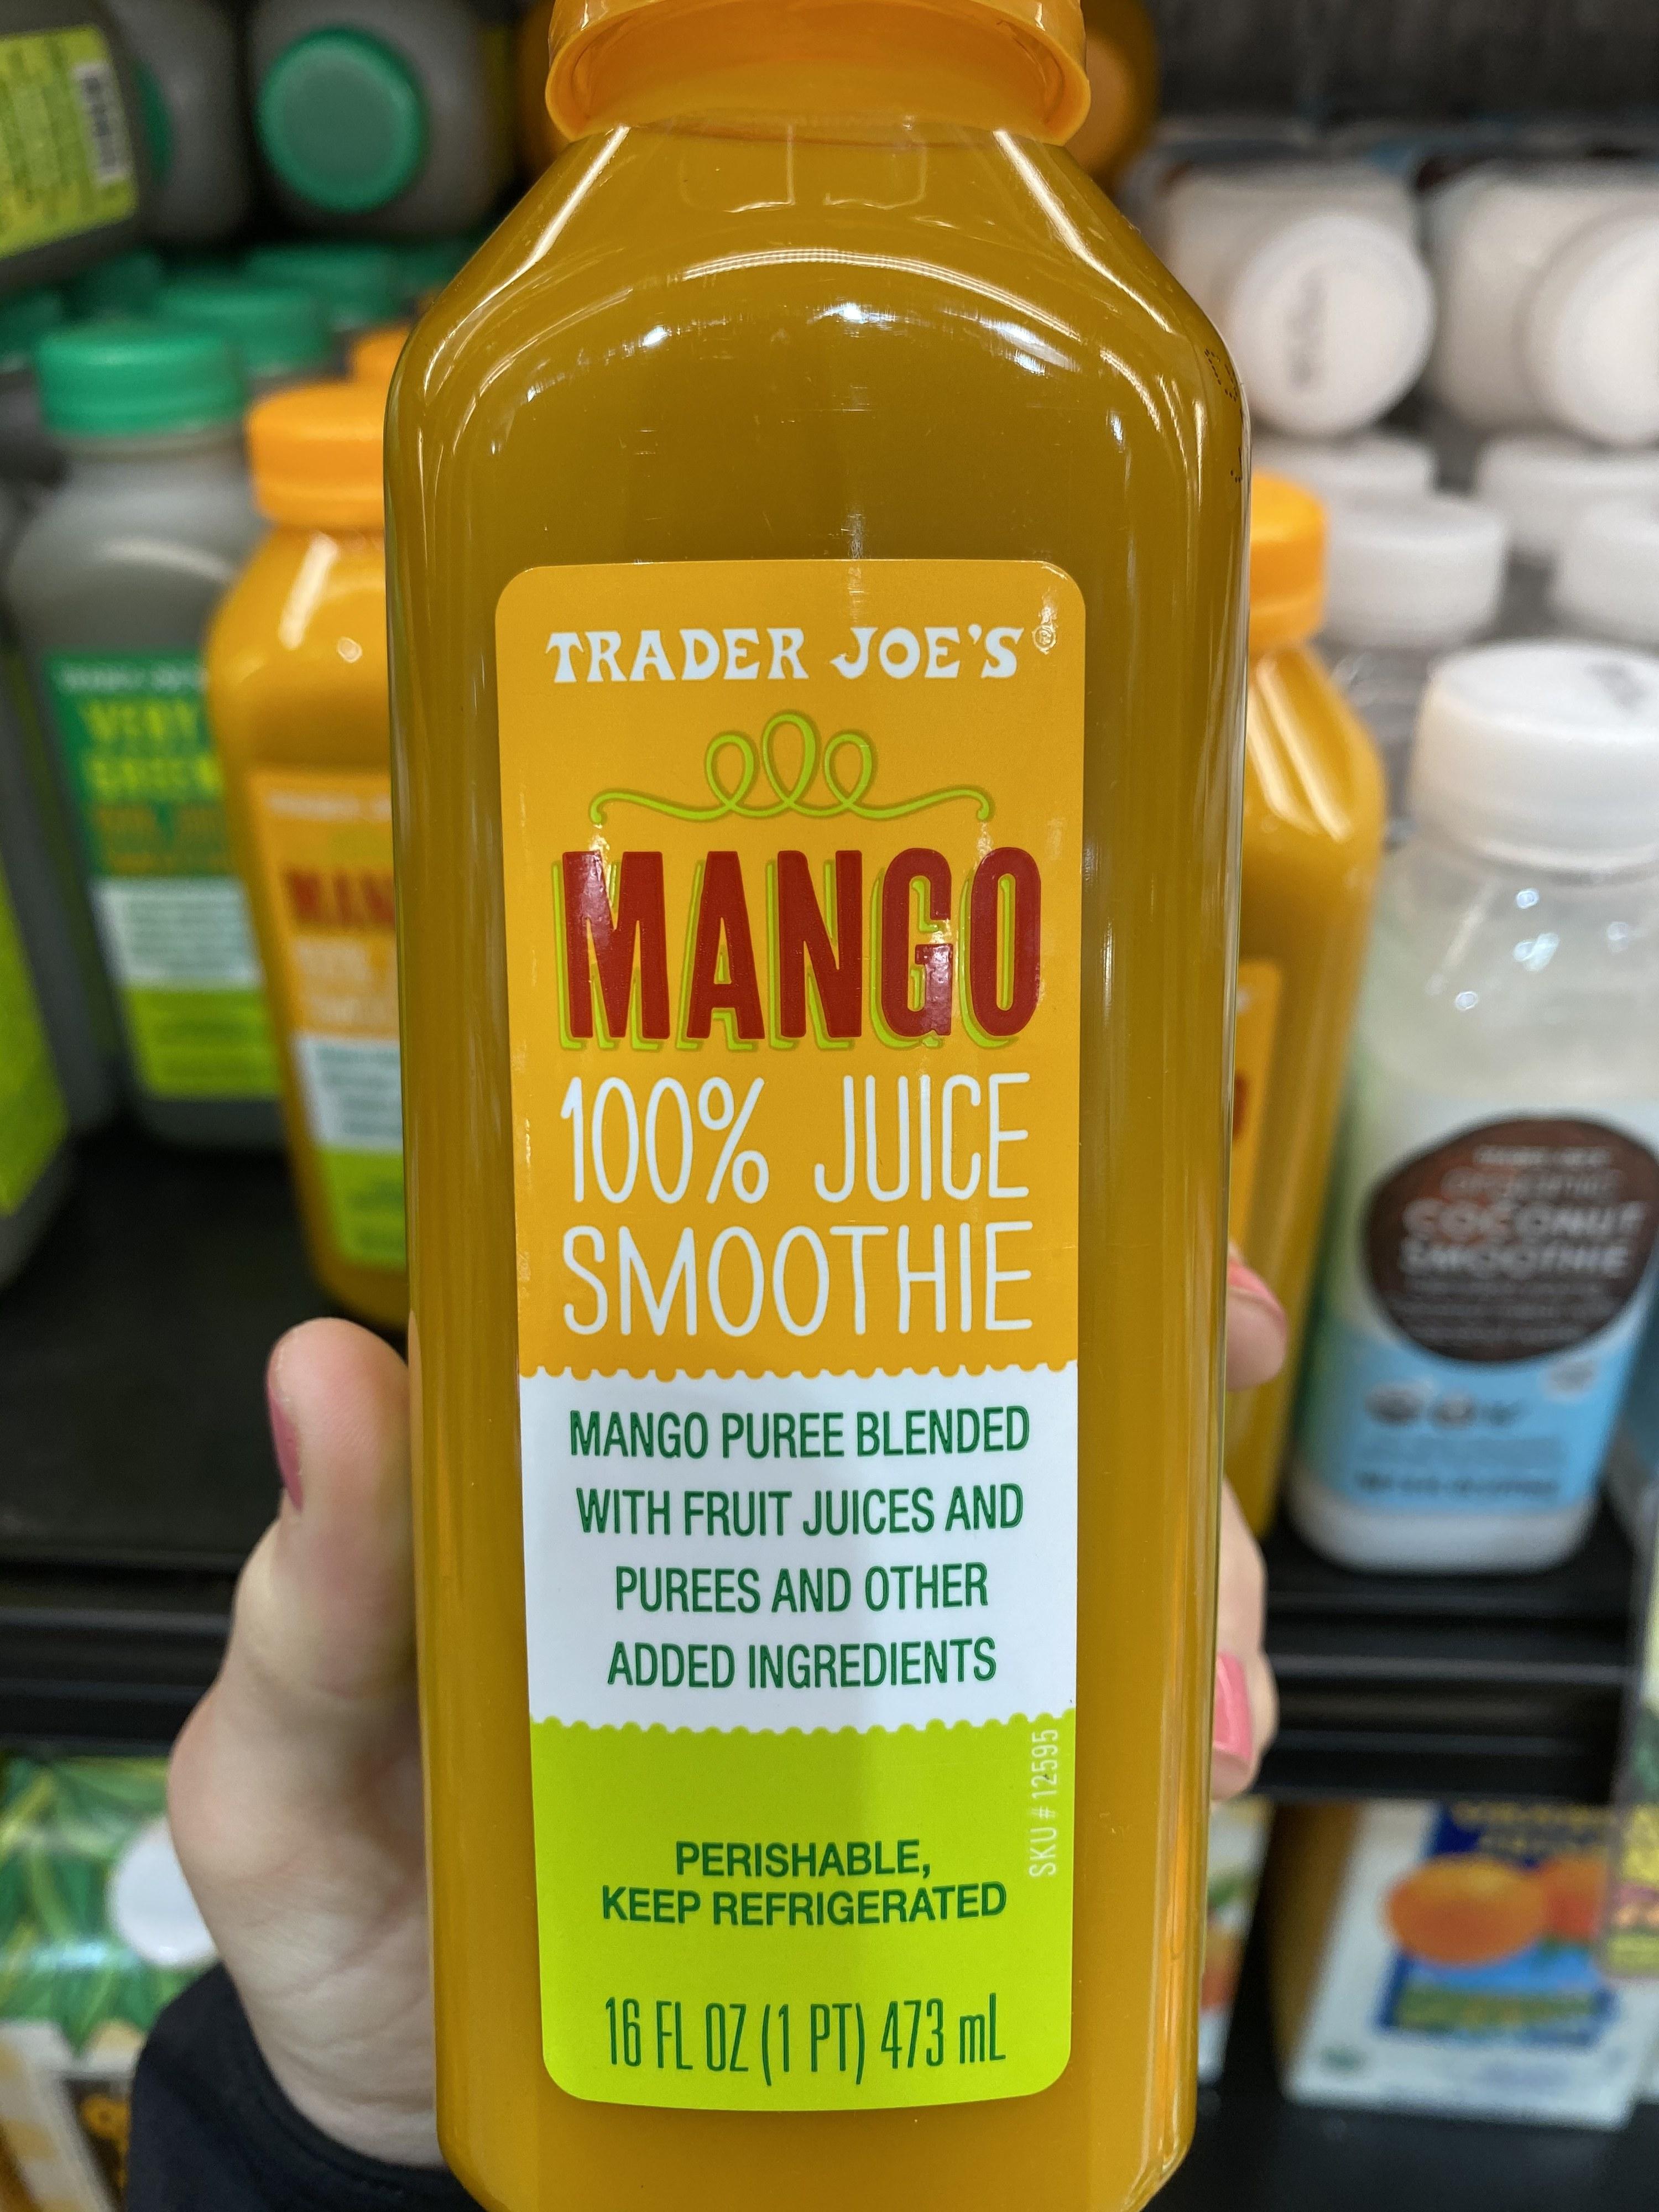 A bottle of Trader Joe's mango smoothie.